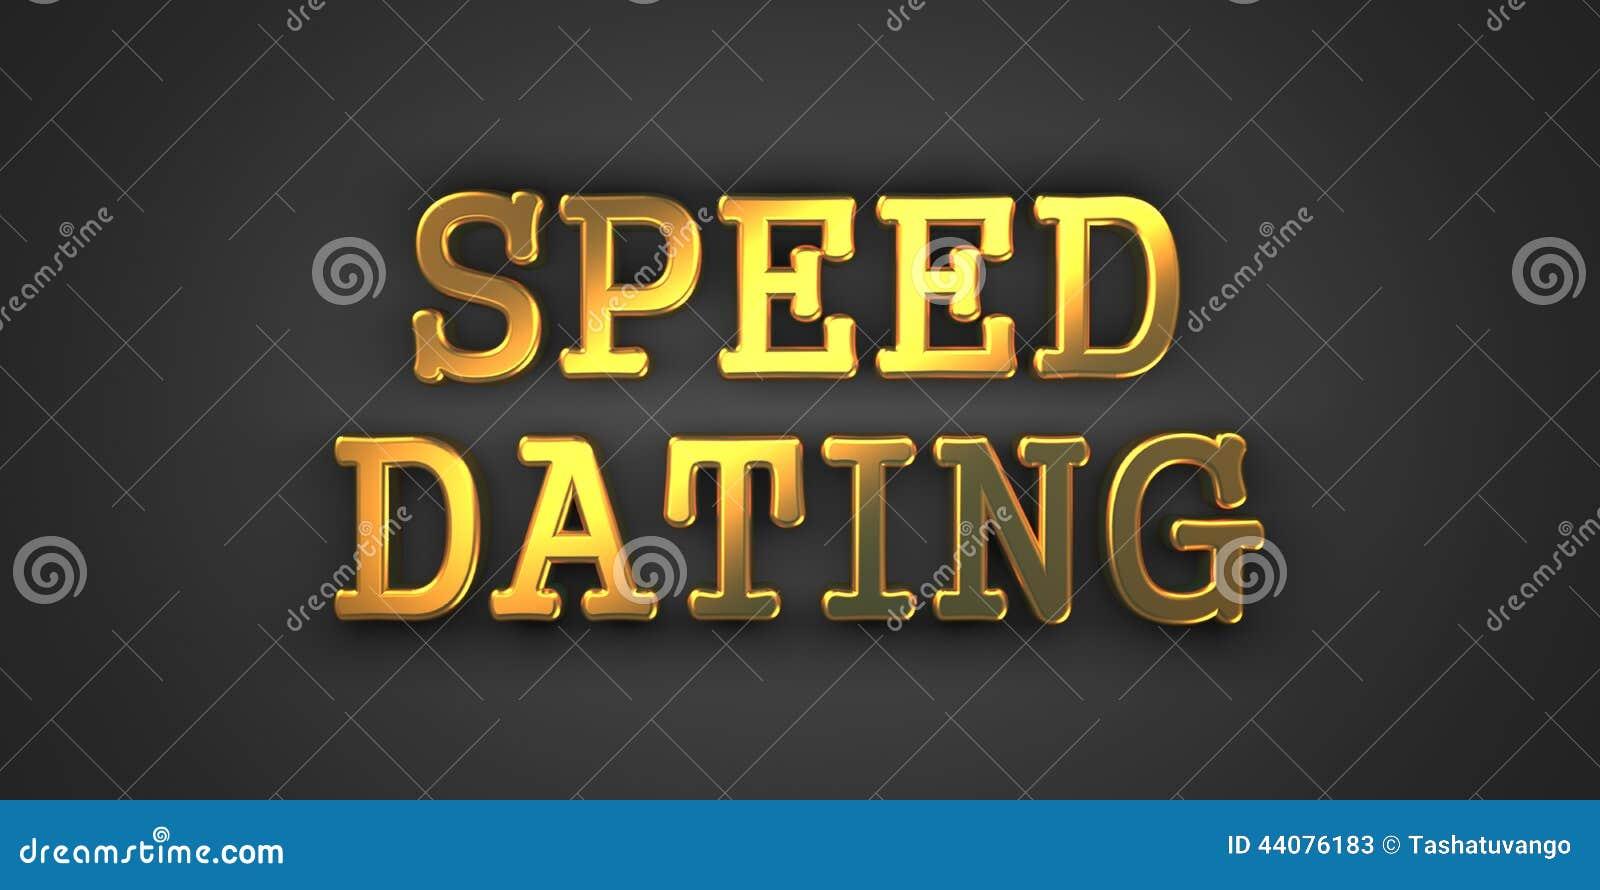 Datinggold